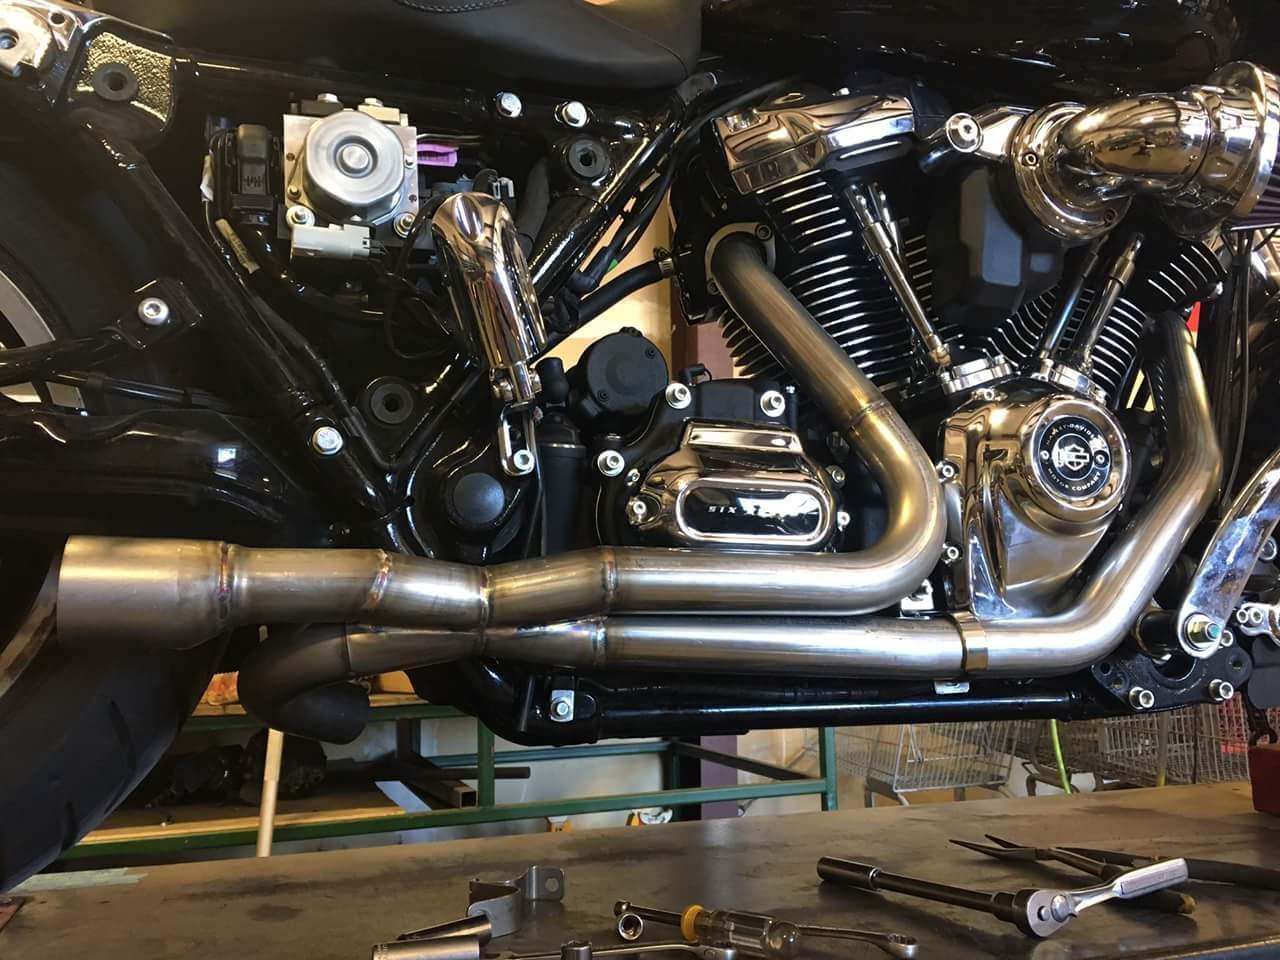 Fullsac MX Header pipe - Harley Davidson Forums